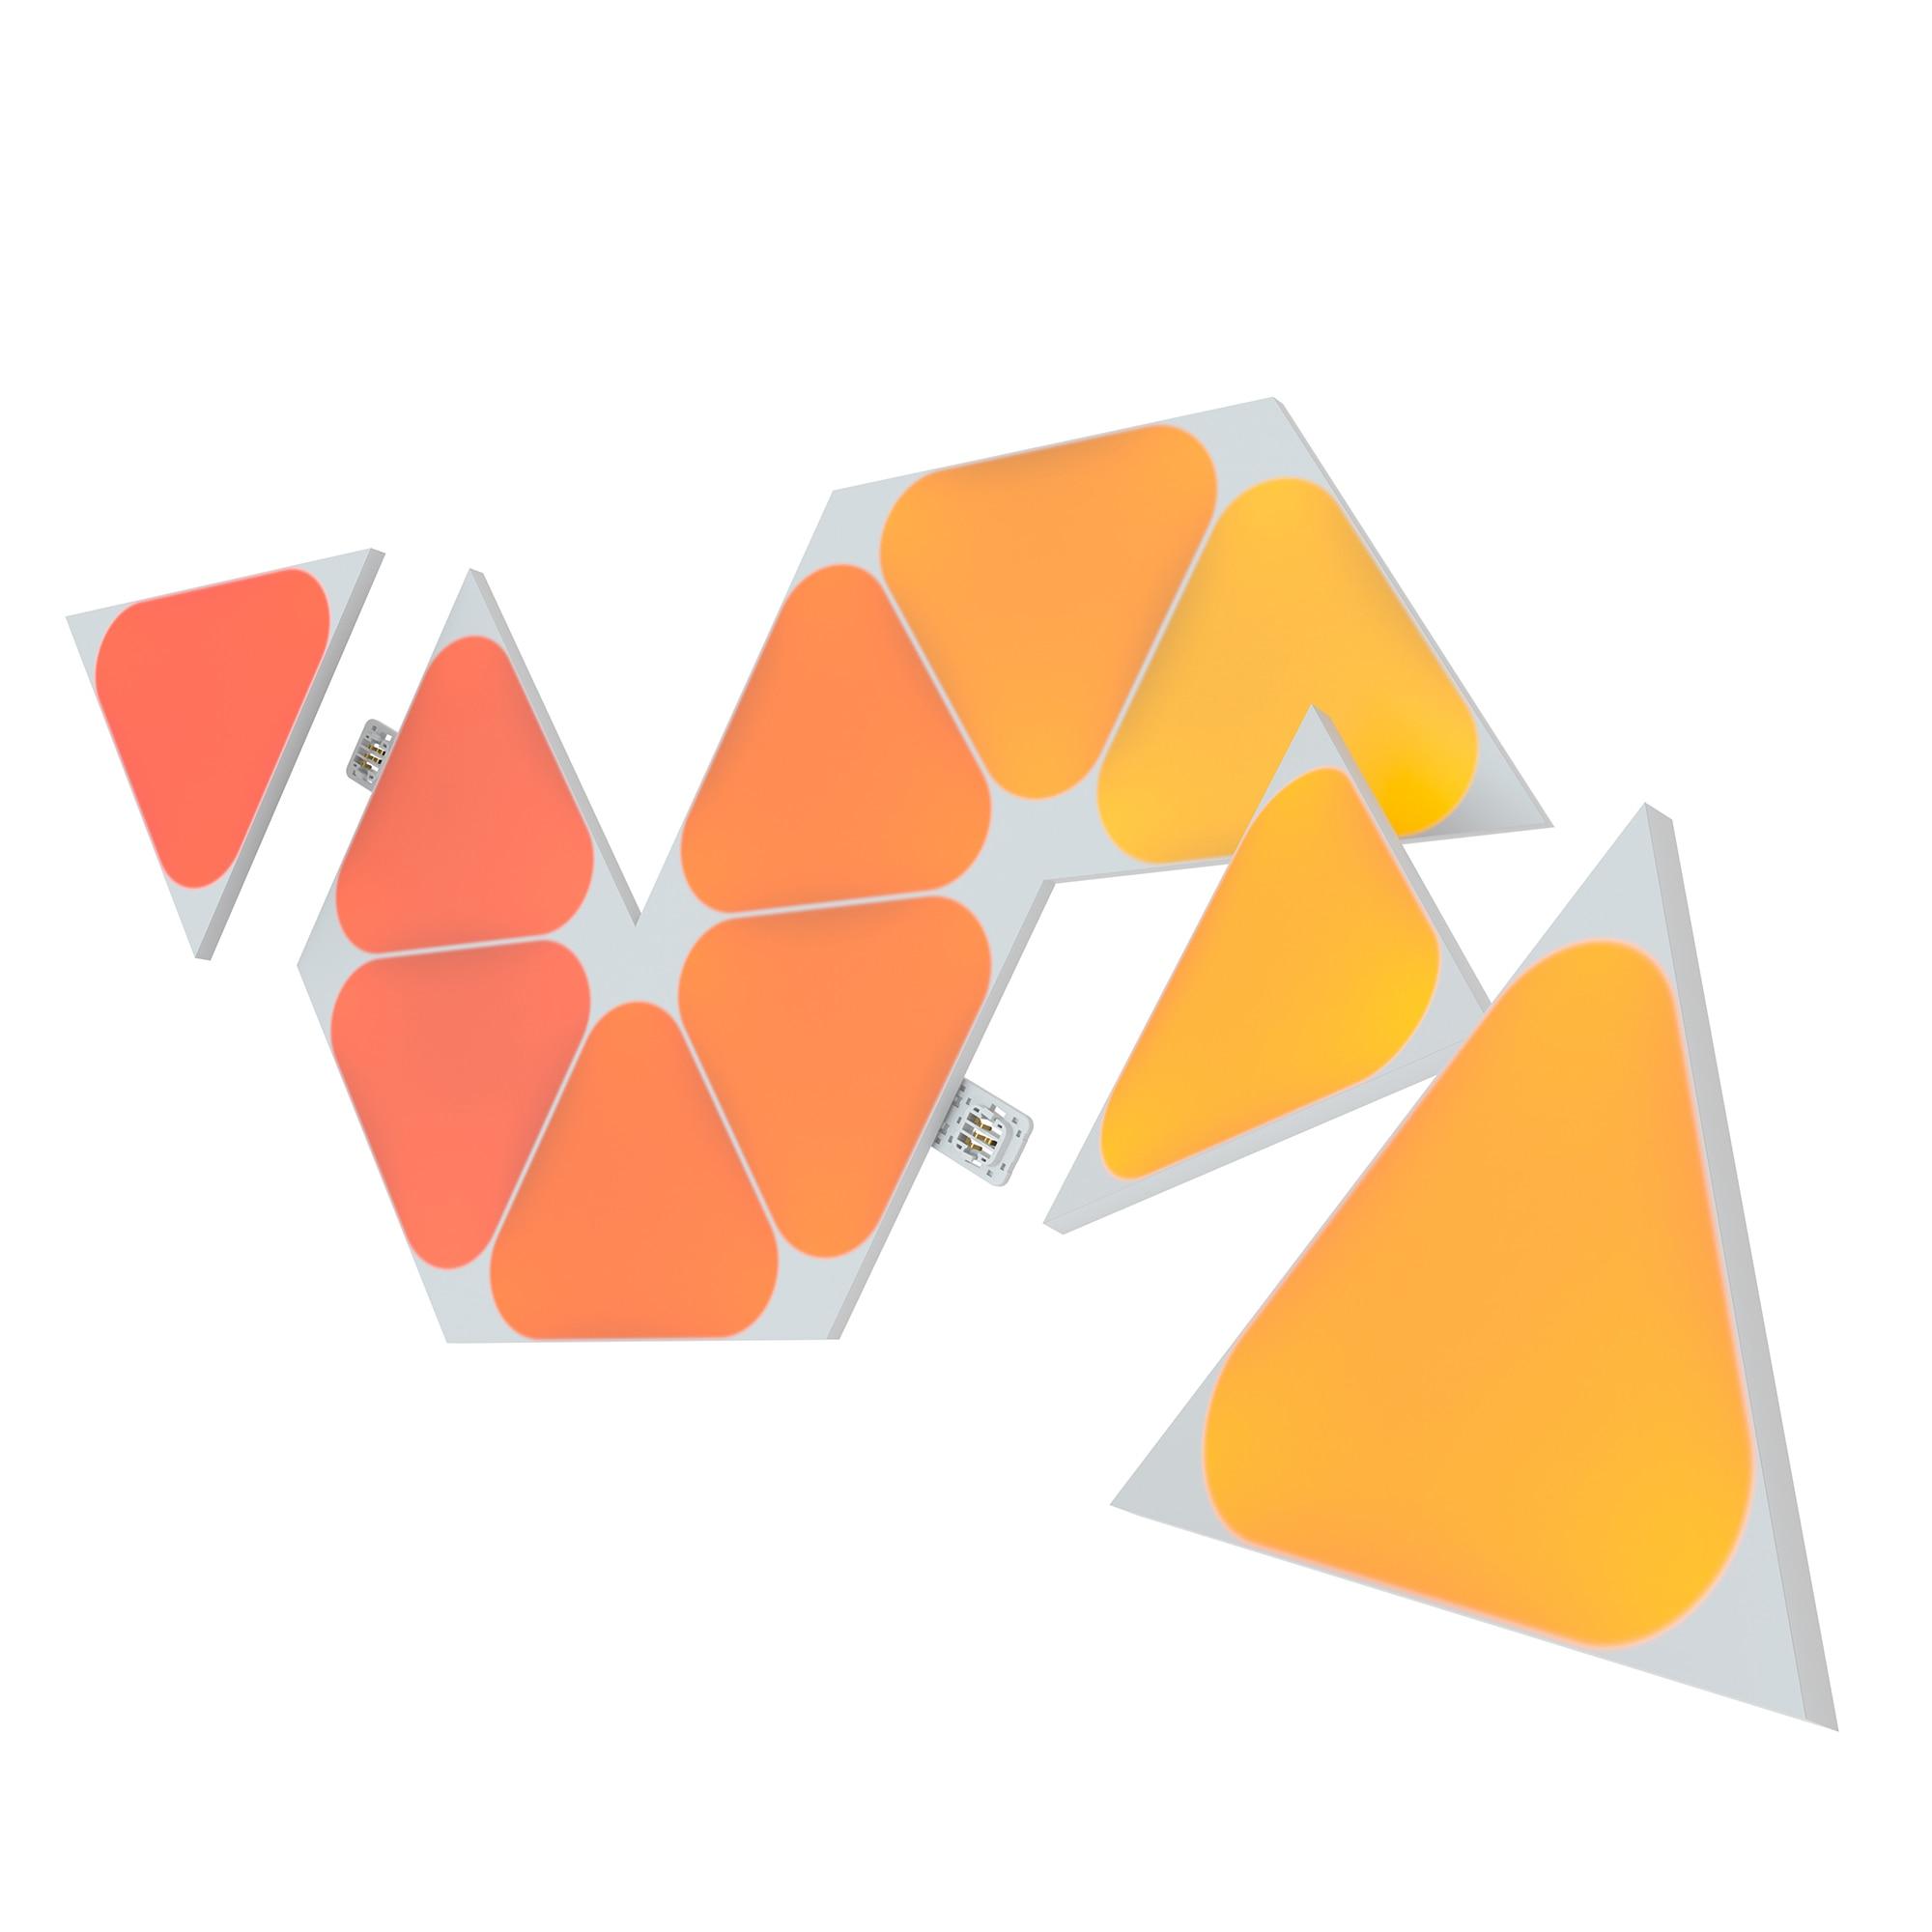 Fotografie Kit panouri luminoase LED modulare inteligente Nanoleaf Shapes Triangles Mini Expansion Pack, RGBW, W-Fi, 200 lm, senzor muzica, compatibil iOS/Android, Apple HomeKit/Google Home/Amazon Alexa, 10 panouri